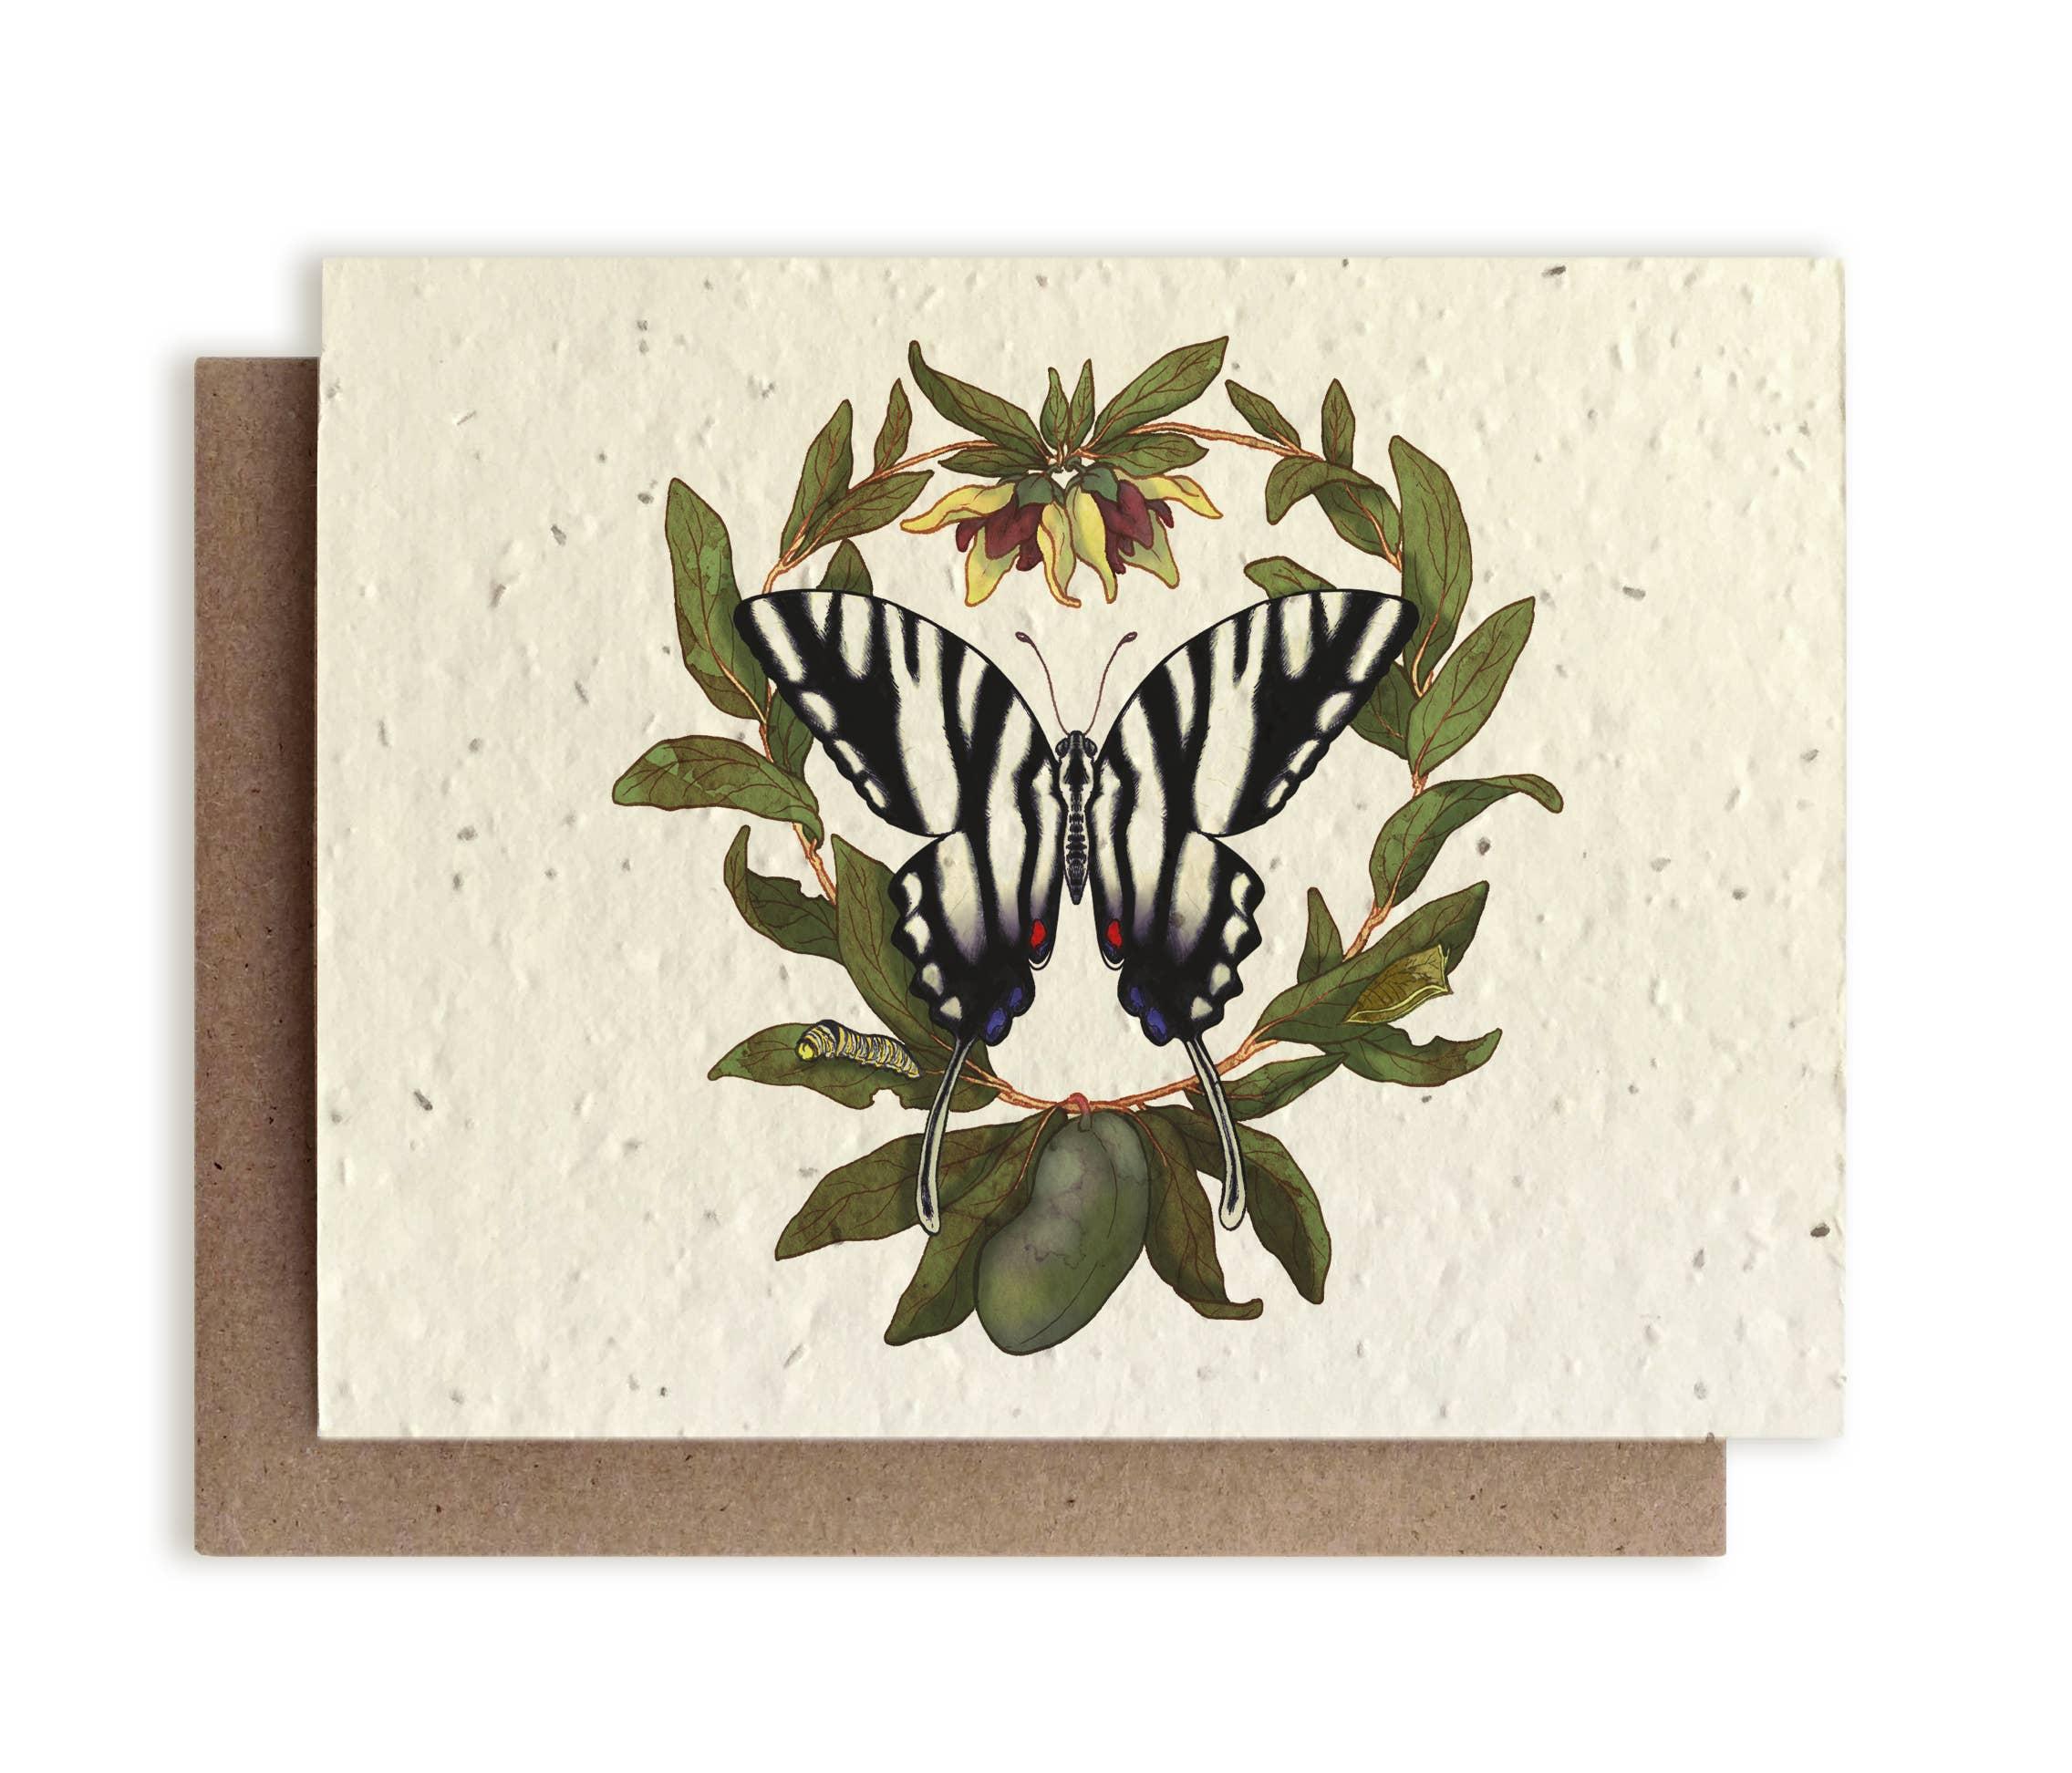 Plantable Vintage Botanical Cards Plune Anemone Wildflower Seed Paper Beyond Zero Waste